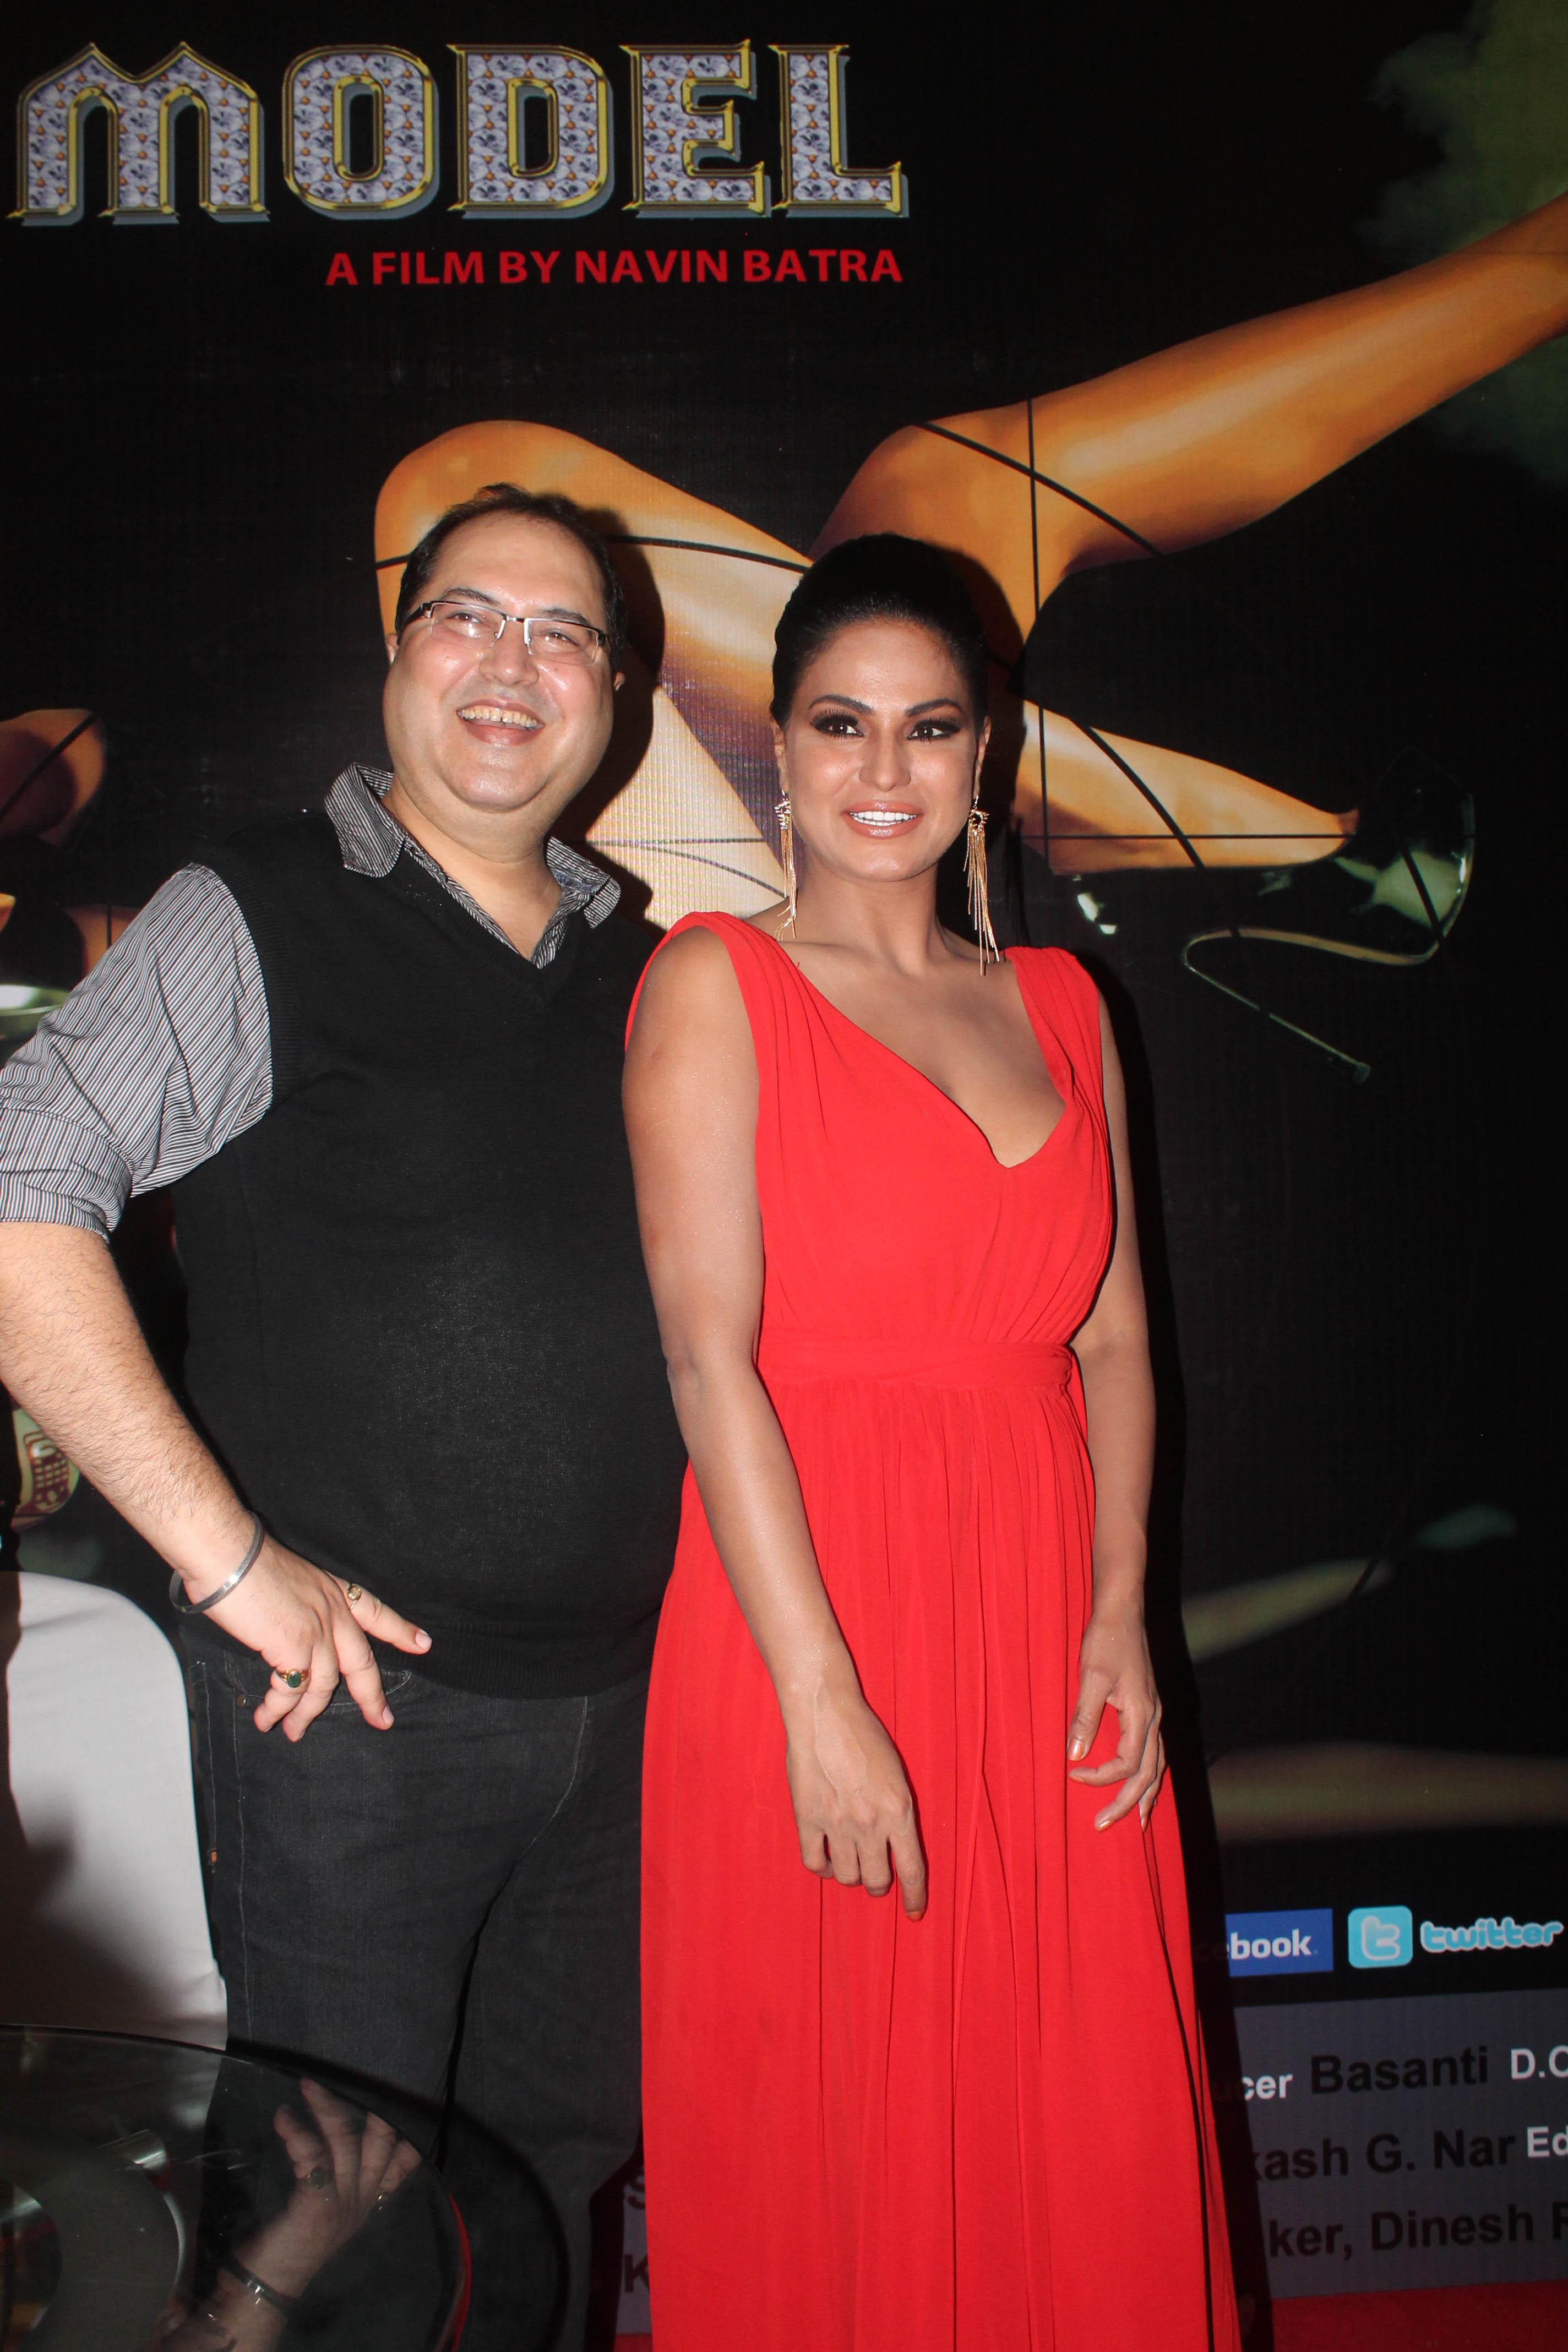 Director Navin Batra With Veena Malik At First Look Of Supermodel1